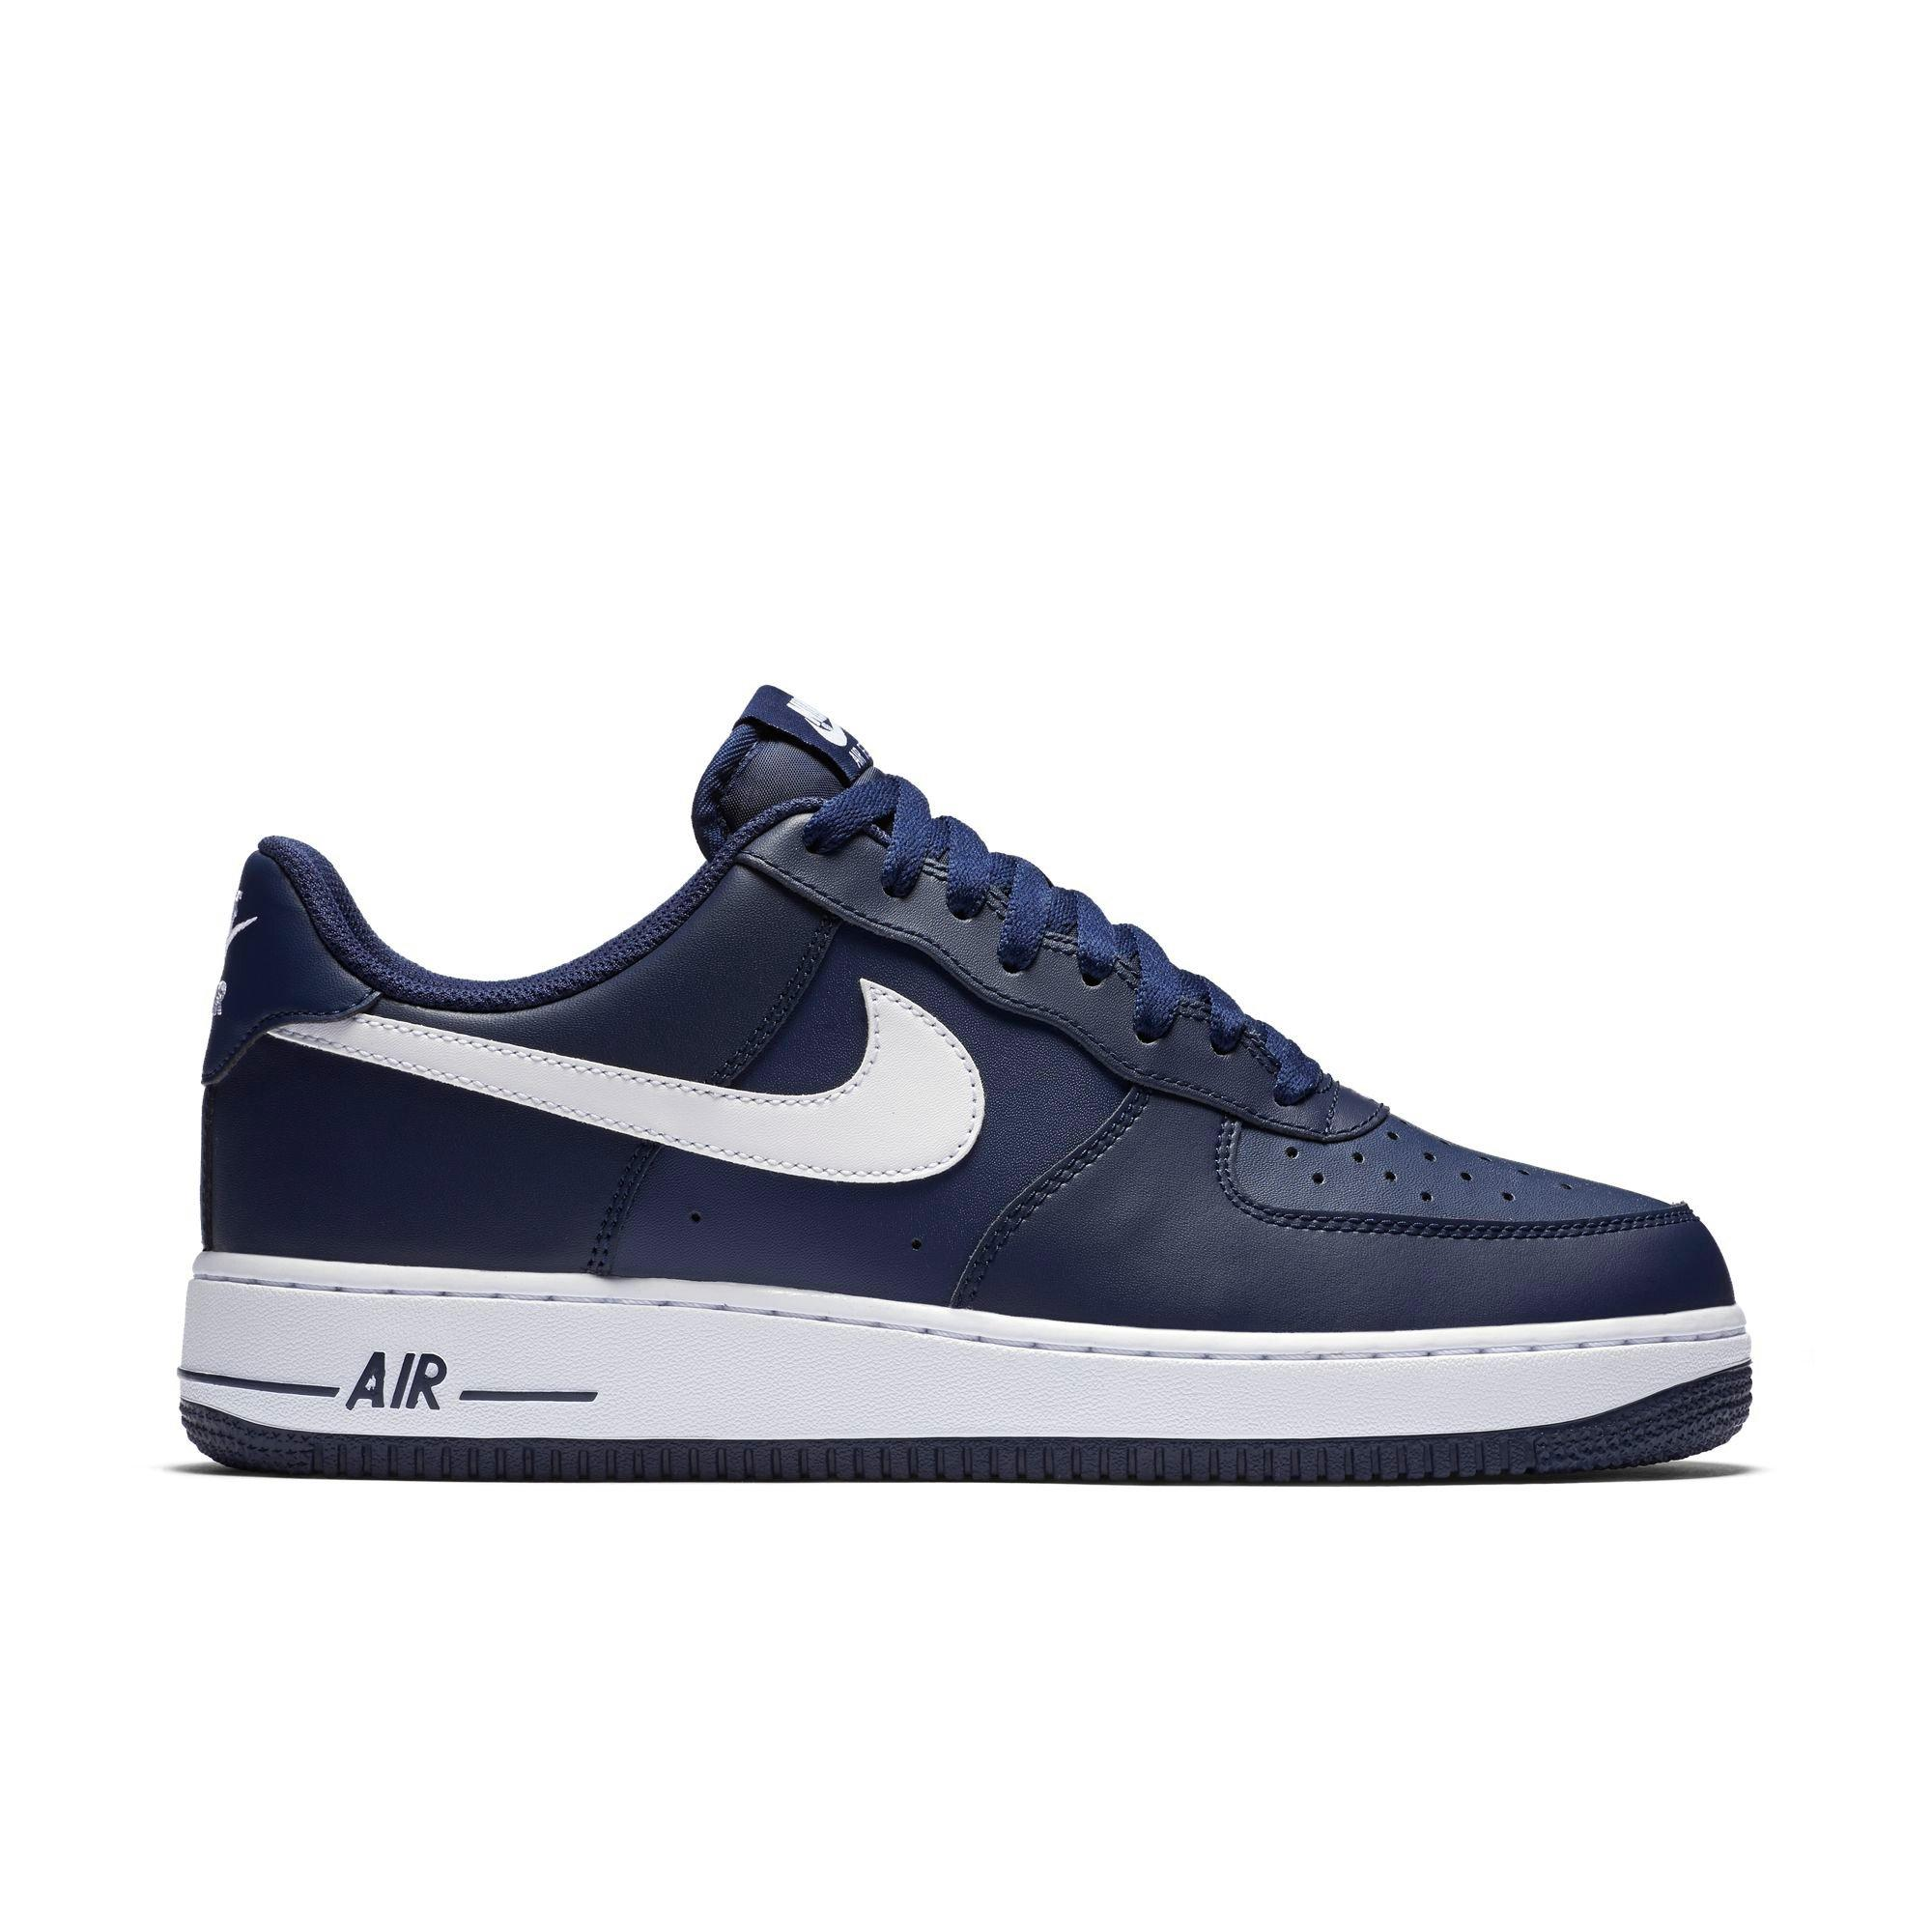 nike shoes air force black. shoe type nike shoes air force black l